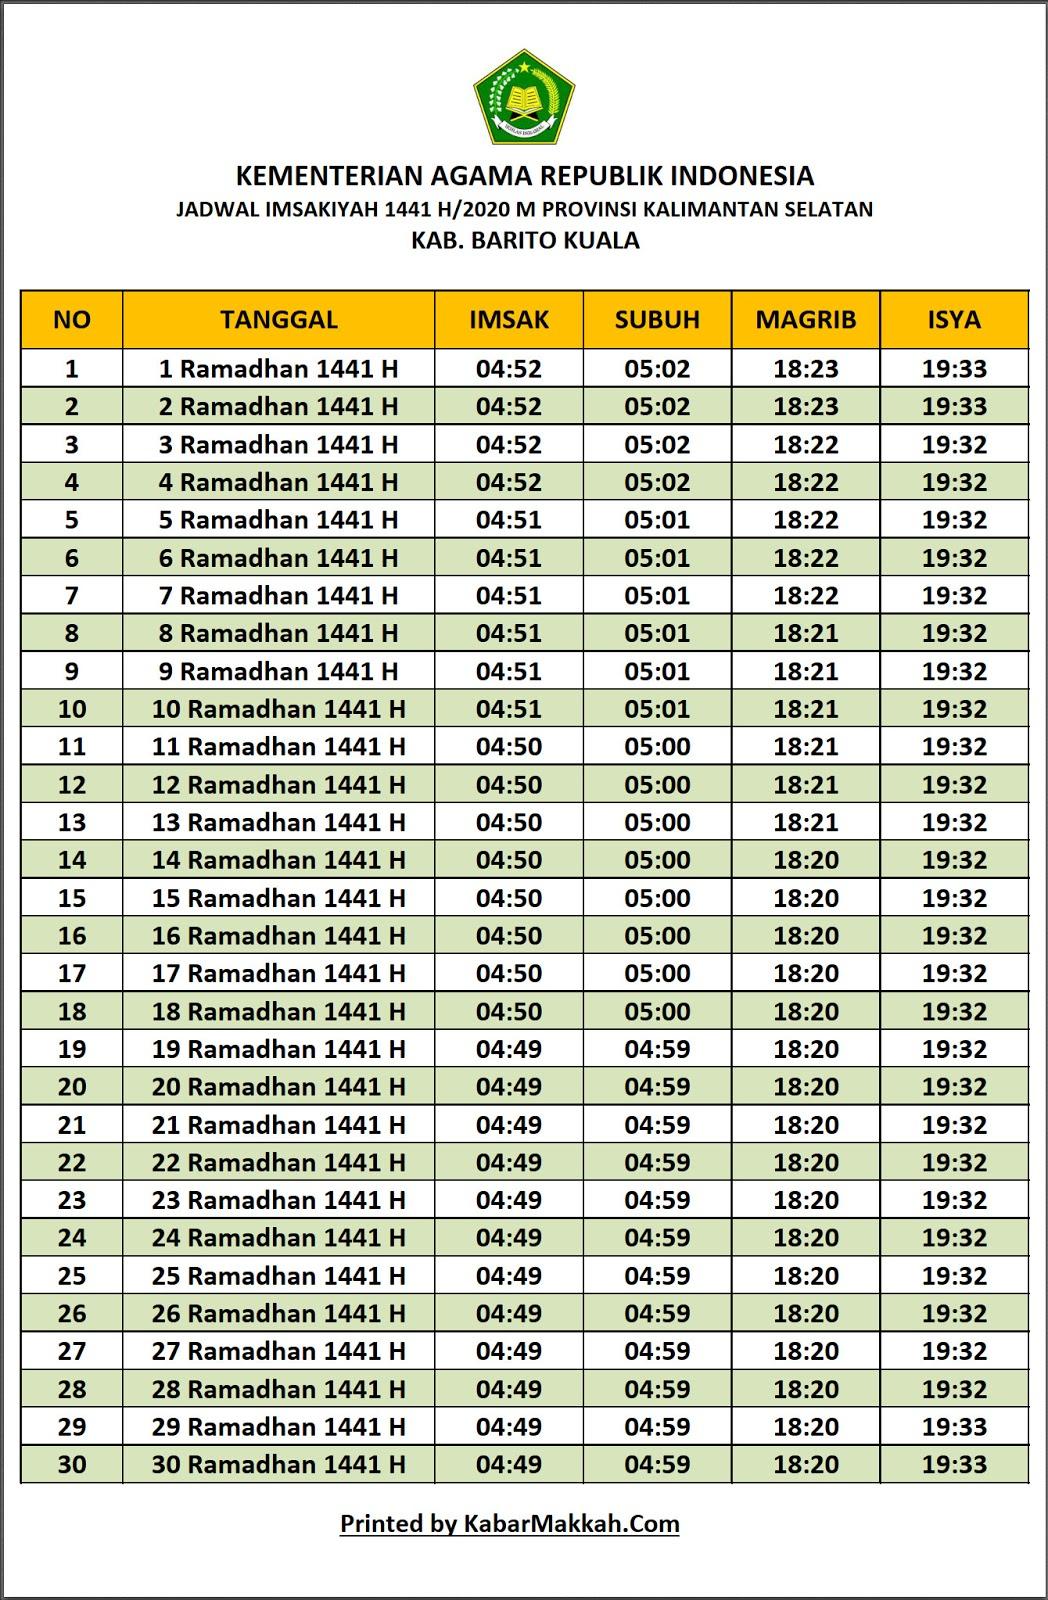 Jadwal Imsakiyah Barito Kuala 2020